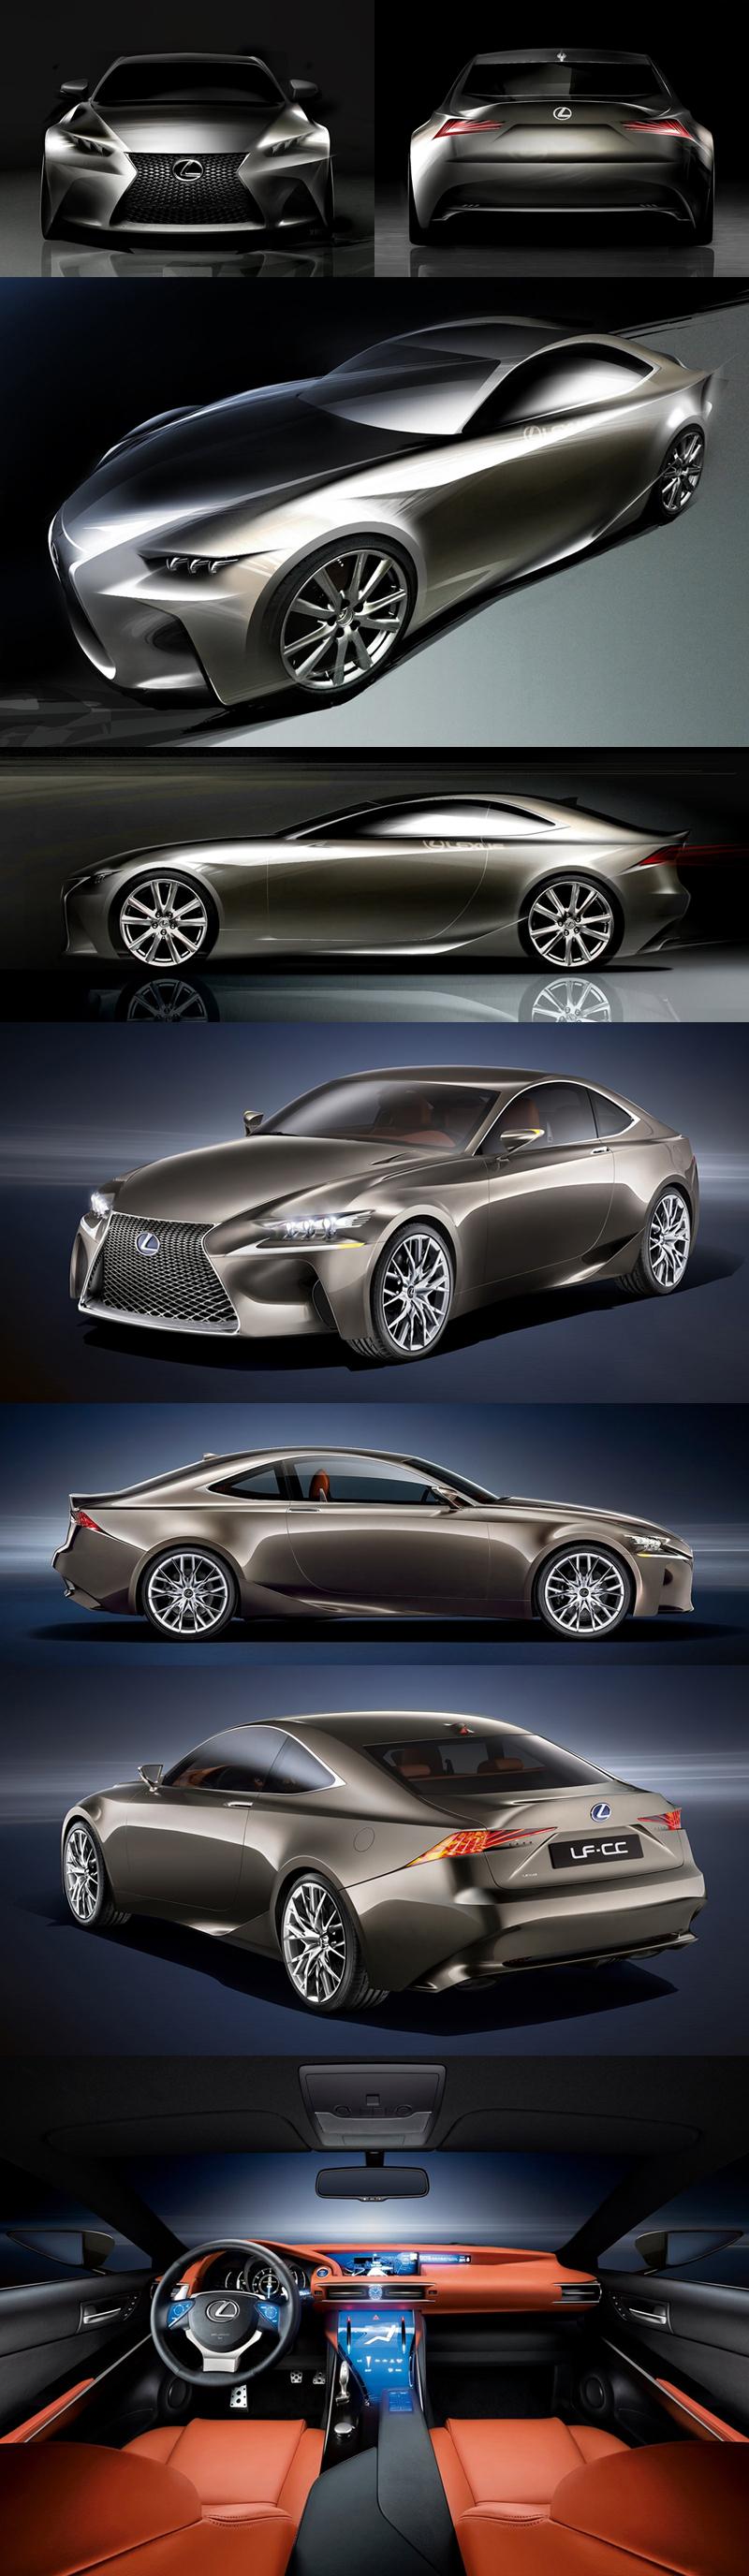 2012_Lexus_LF_CC